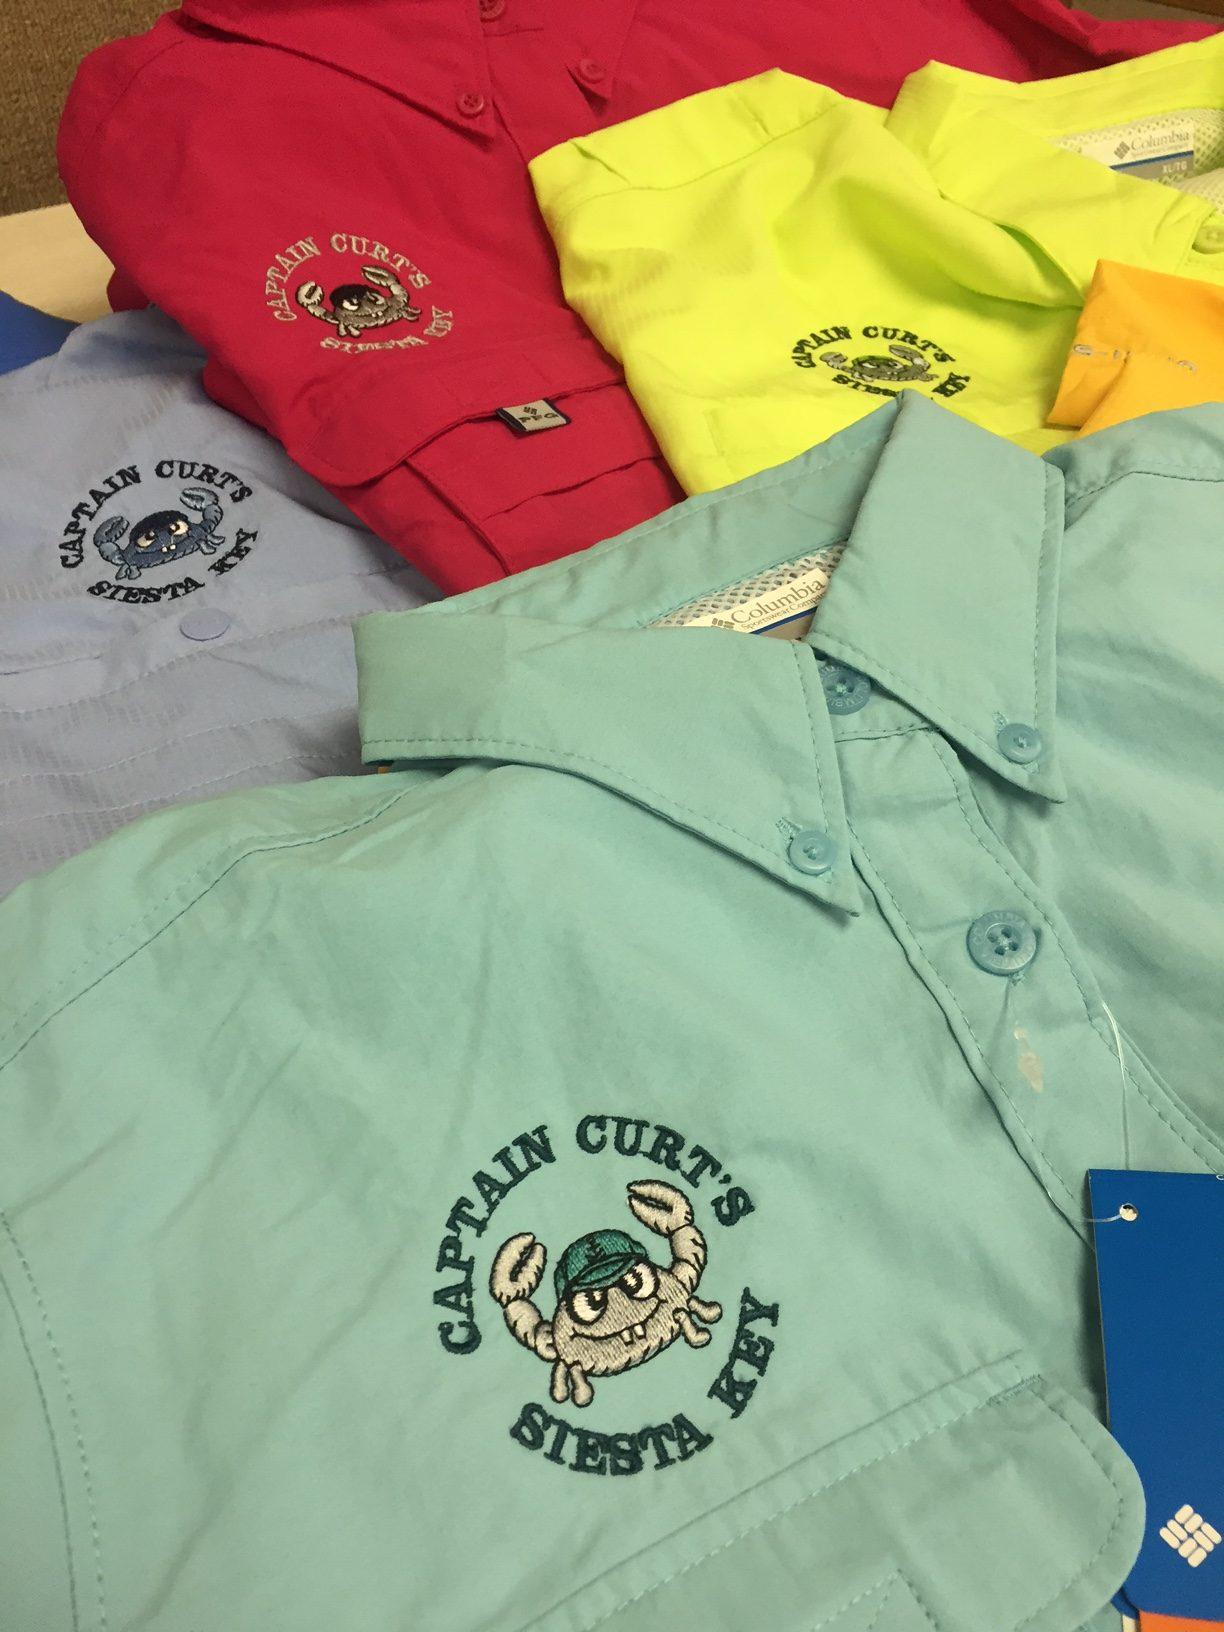 a3eee6c554cc Fishing Shirts Printing